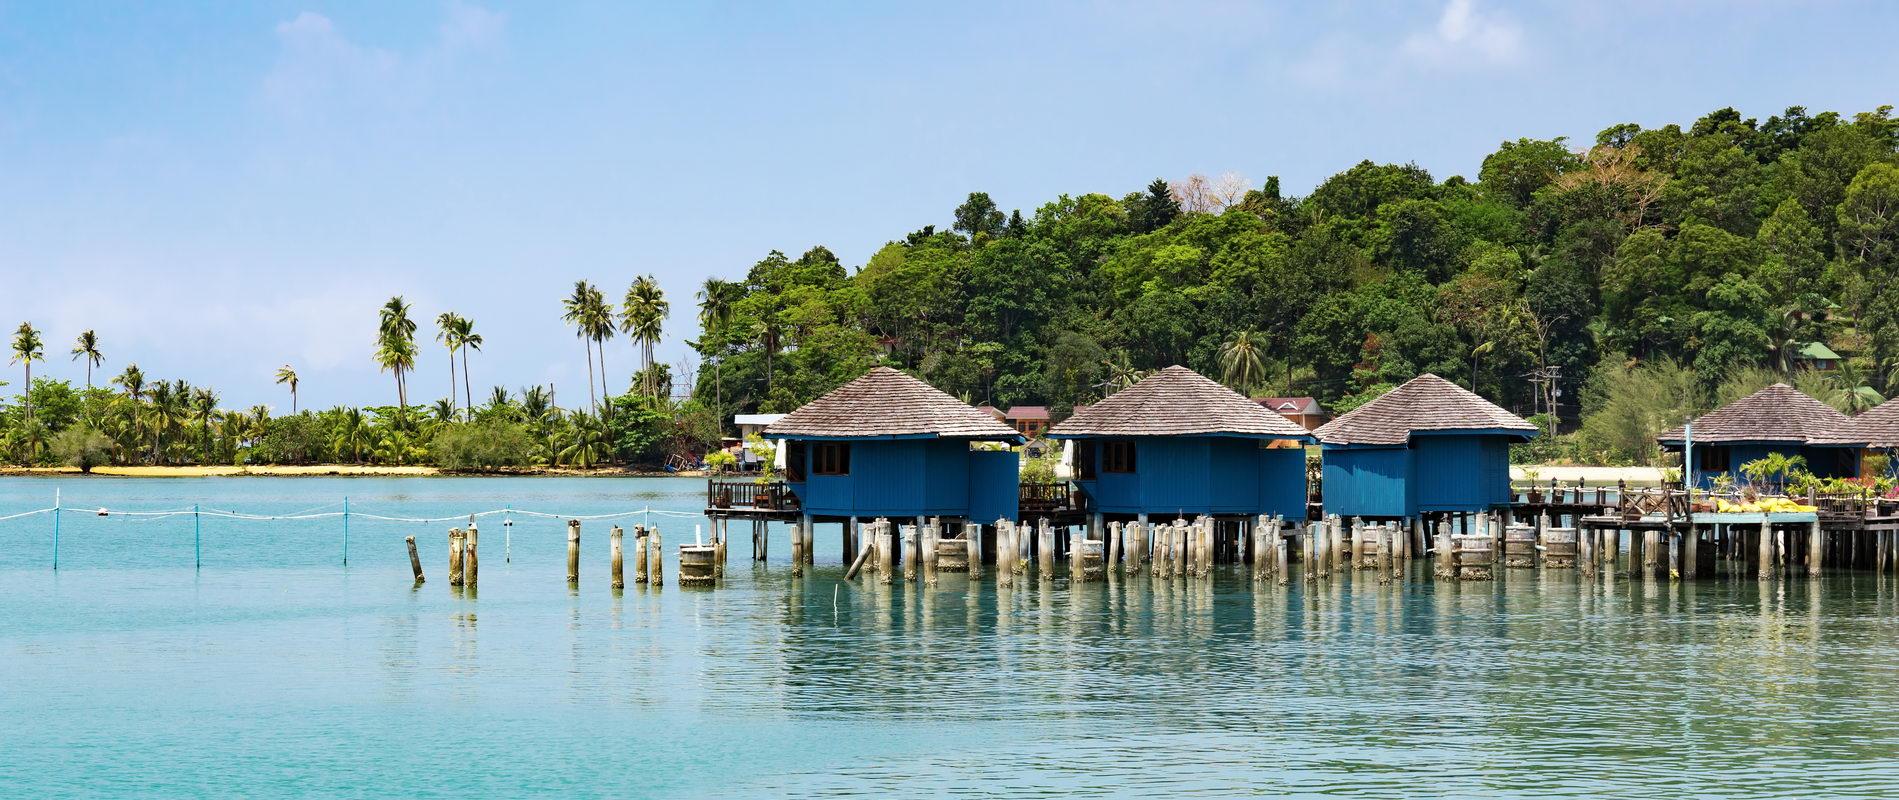 Trend Travel Yachting, Charter Thailand - Fischerdorf Bang Bao, Koh Chang